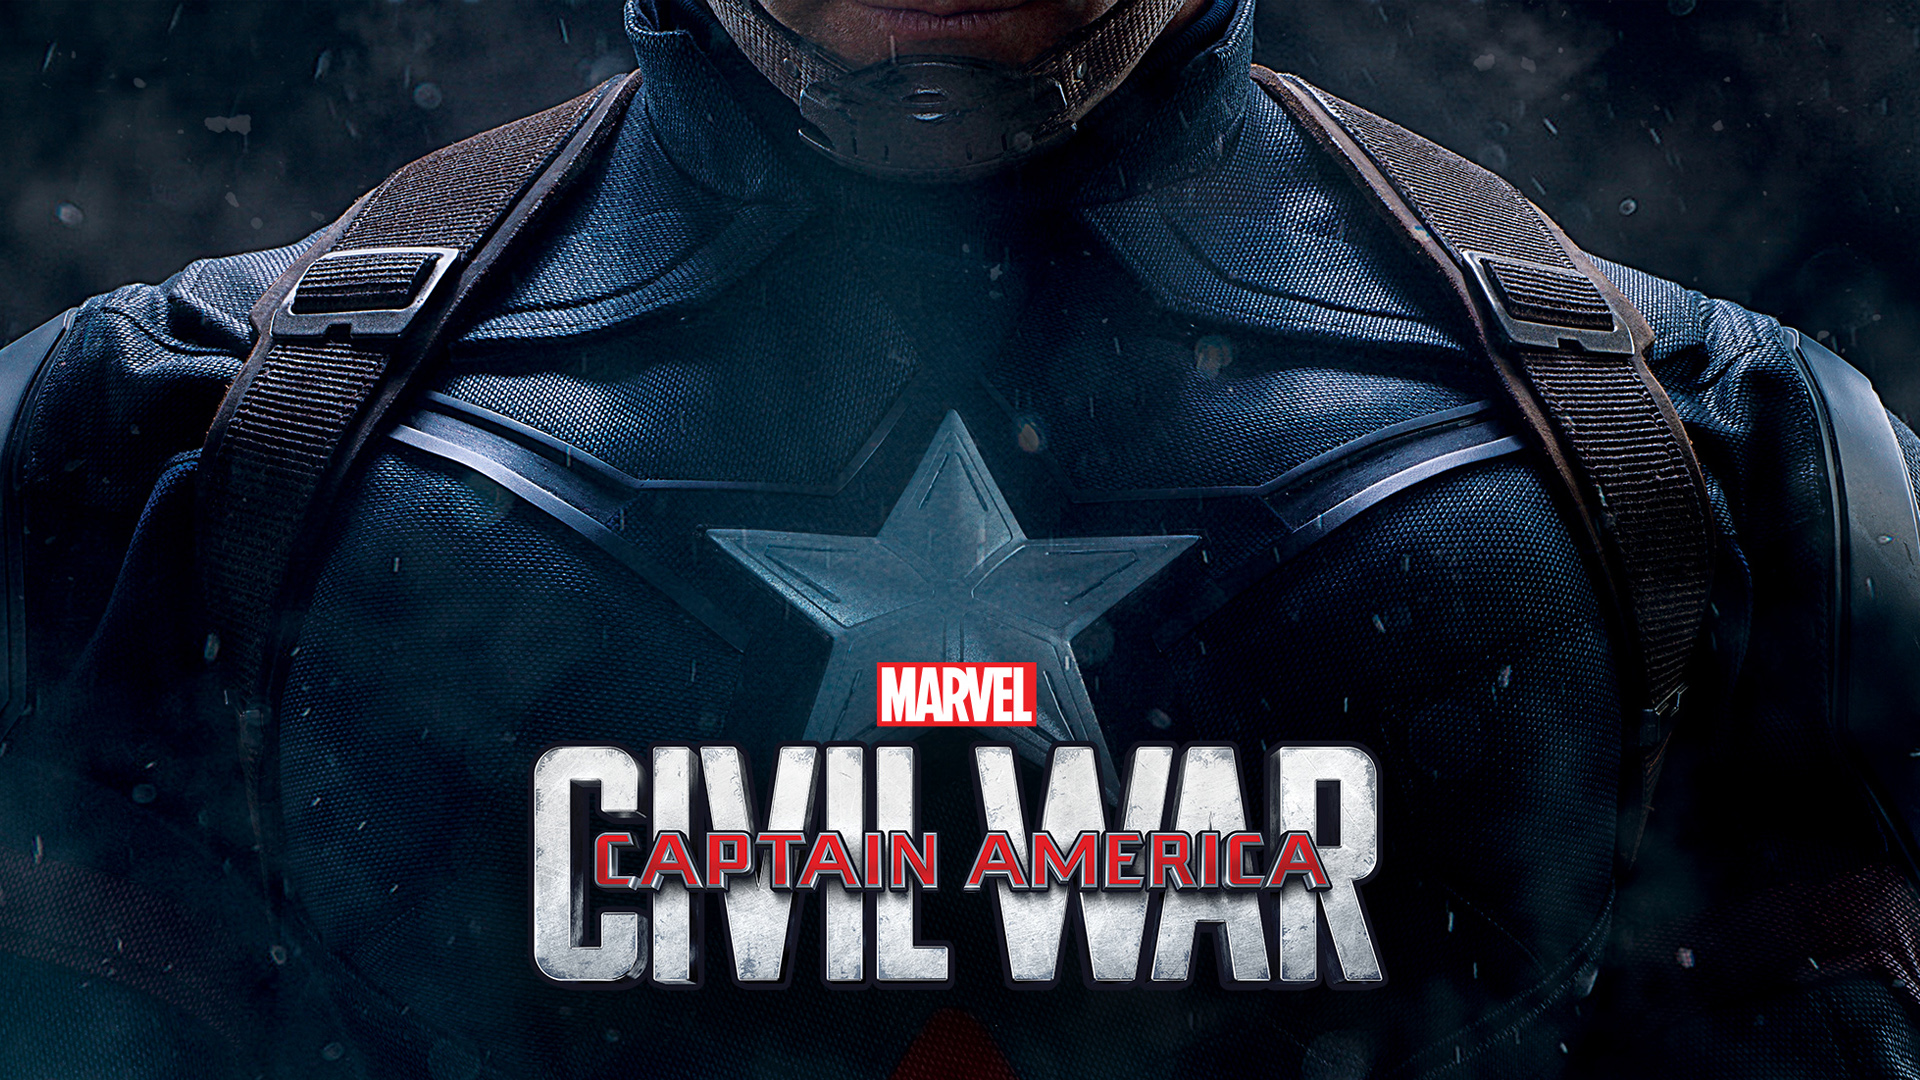 1920x1080px Civil War Captain America Wallpaper 1920x1080